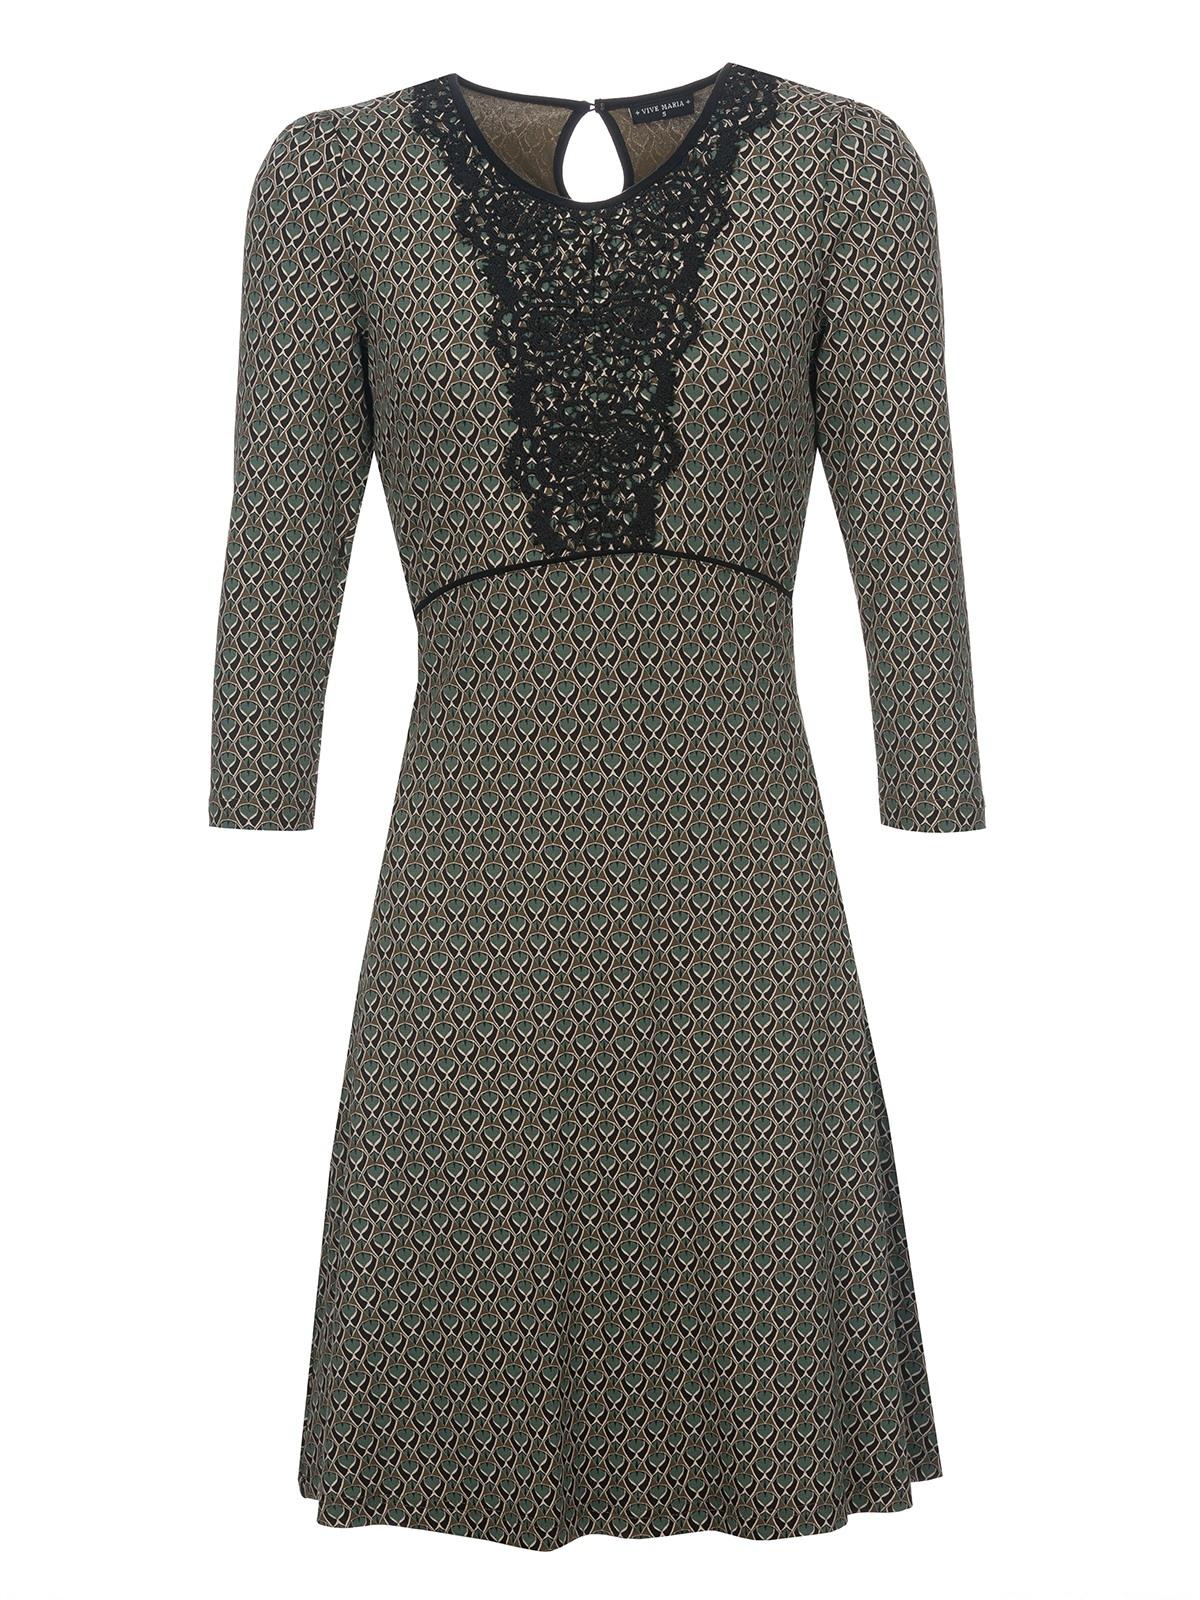 Top Kleid Olivgrün BoutiqueAbend Kreativ Kleid Olivgrün Spezialgebiet